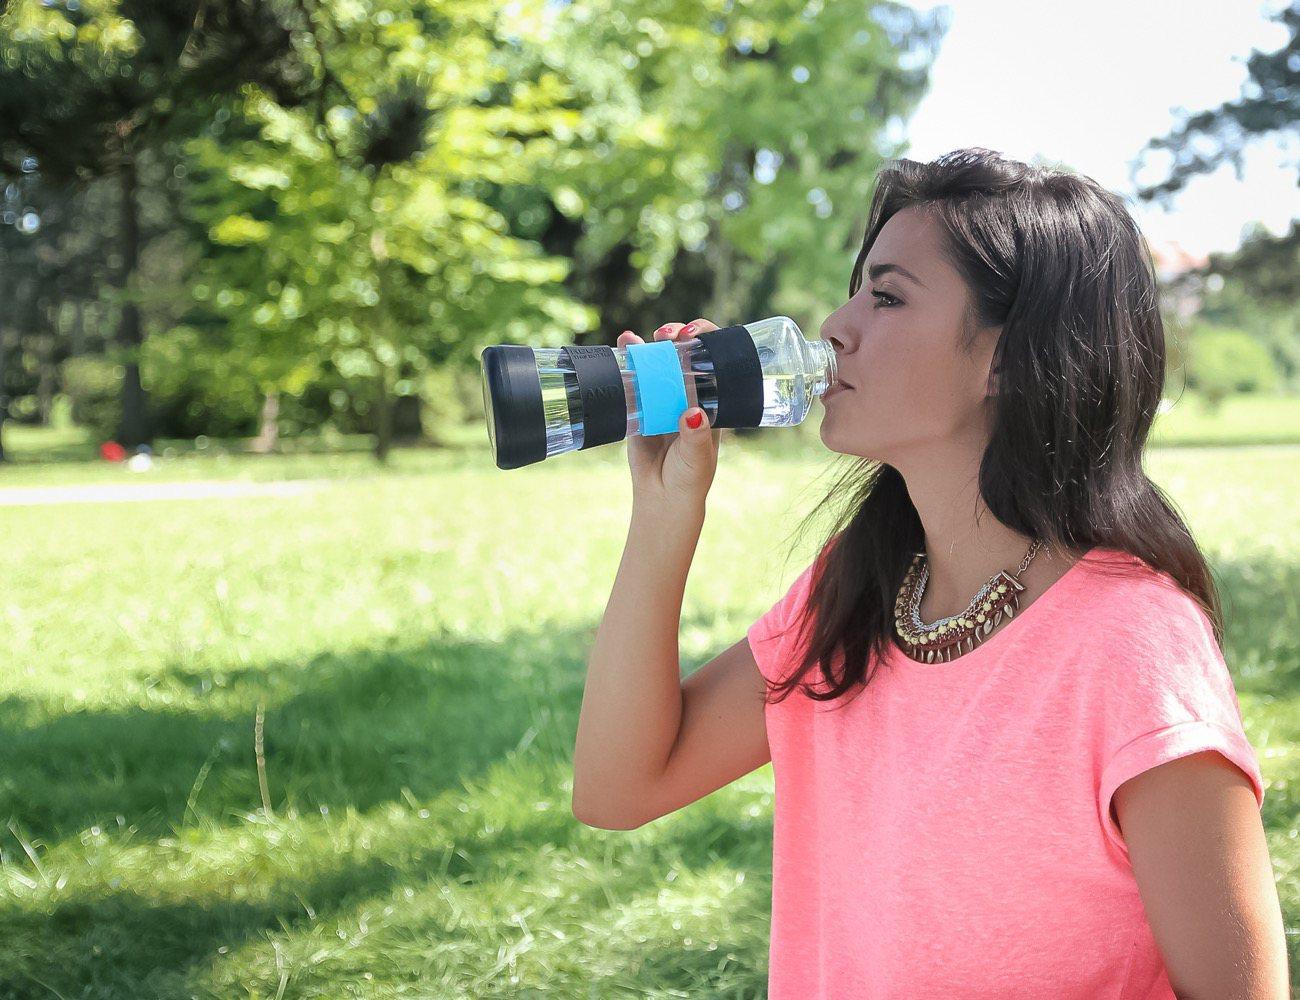 H2O-Pal Hydration Tracker